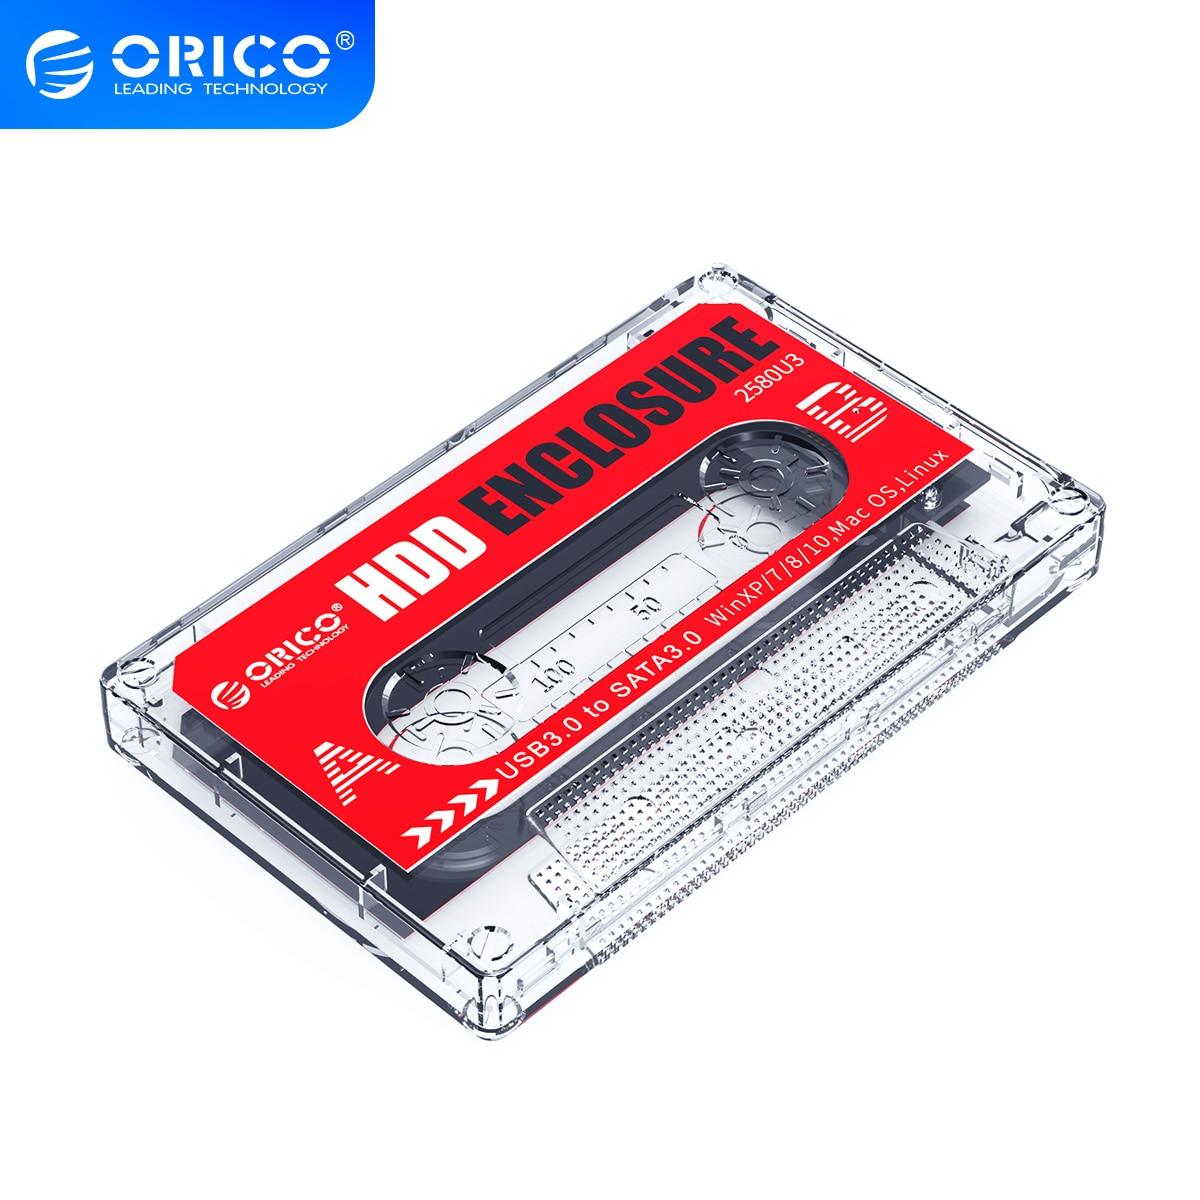 ORICO Transparent External Hard Drive Box USB3.0 SATA3.0 5Gbps 4TB HDD Enclosure Support UASP DIY Stickers Cassette Tape Design